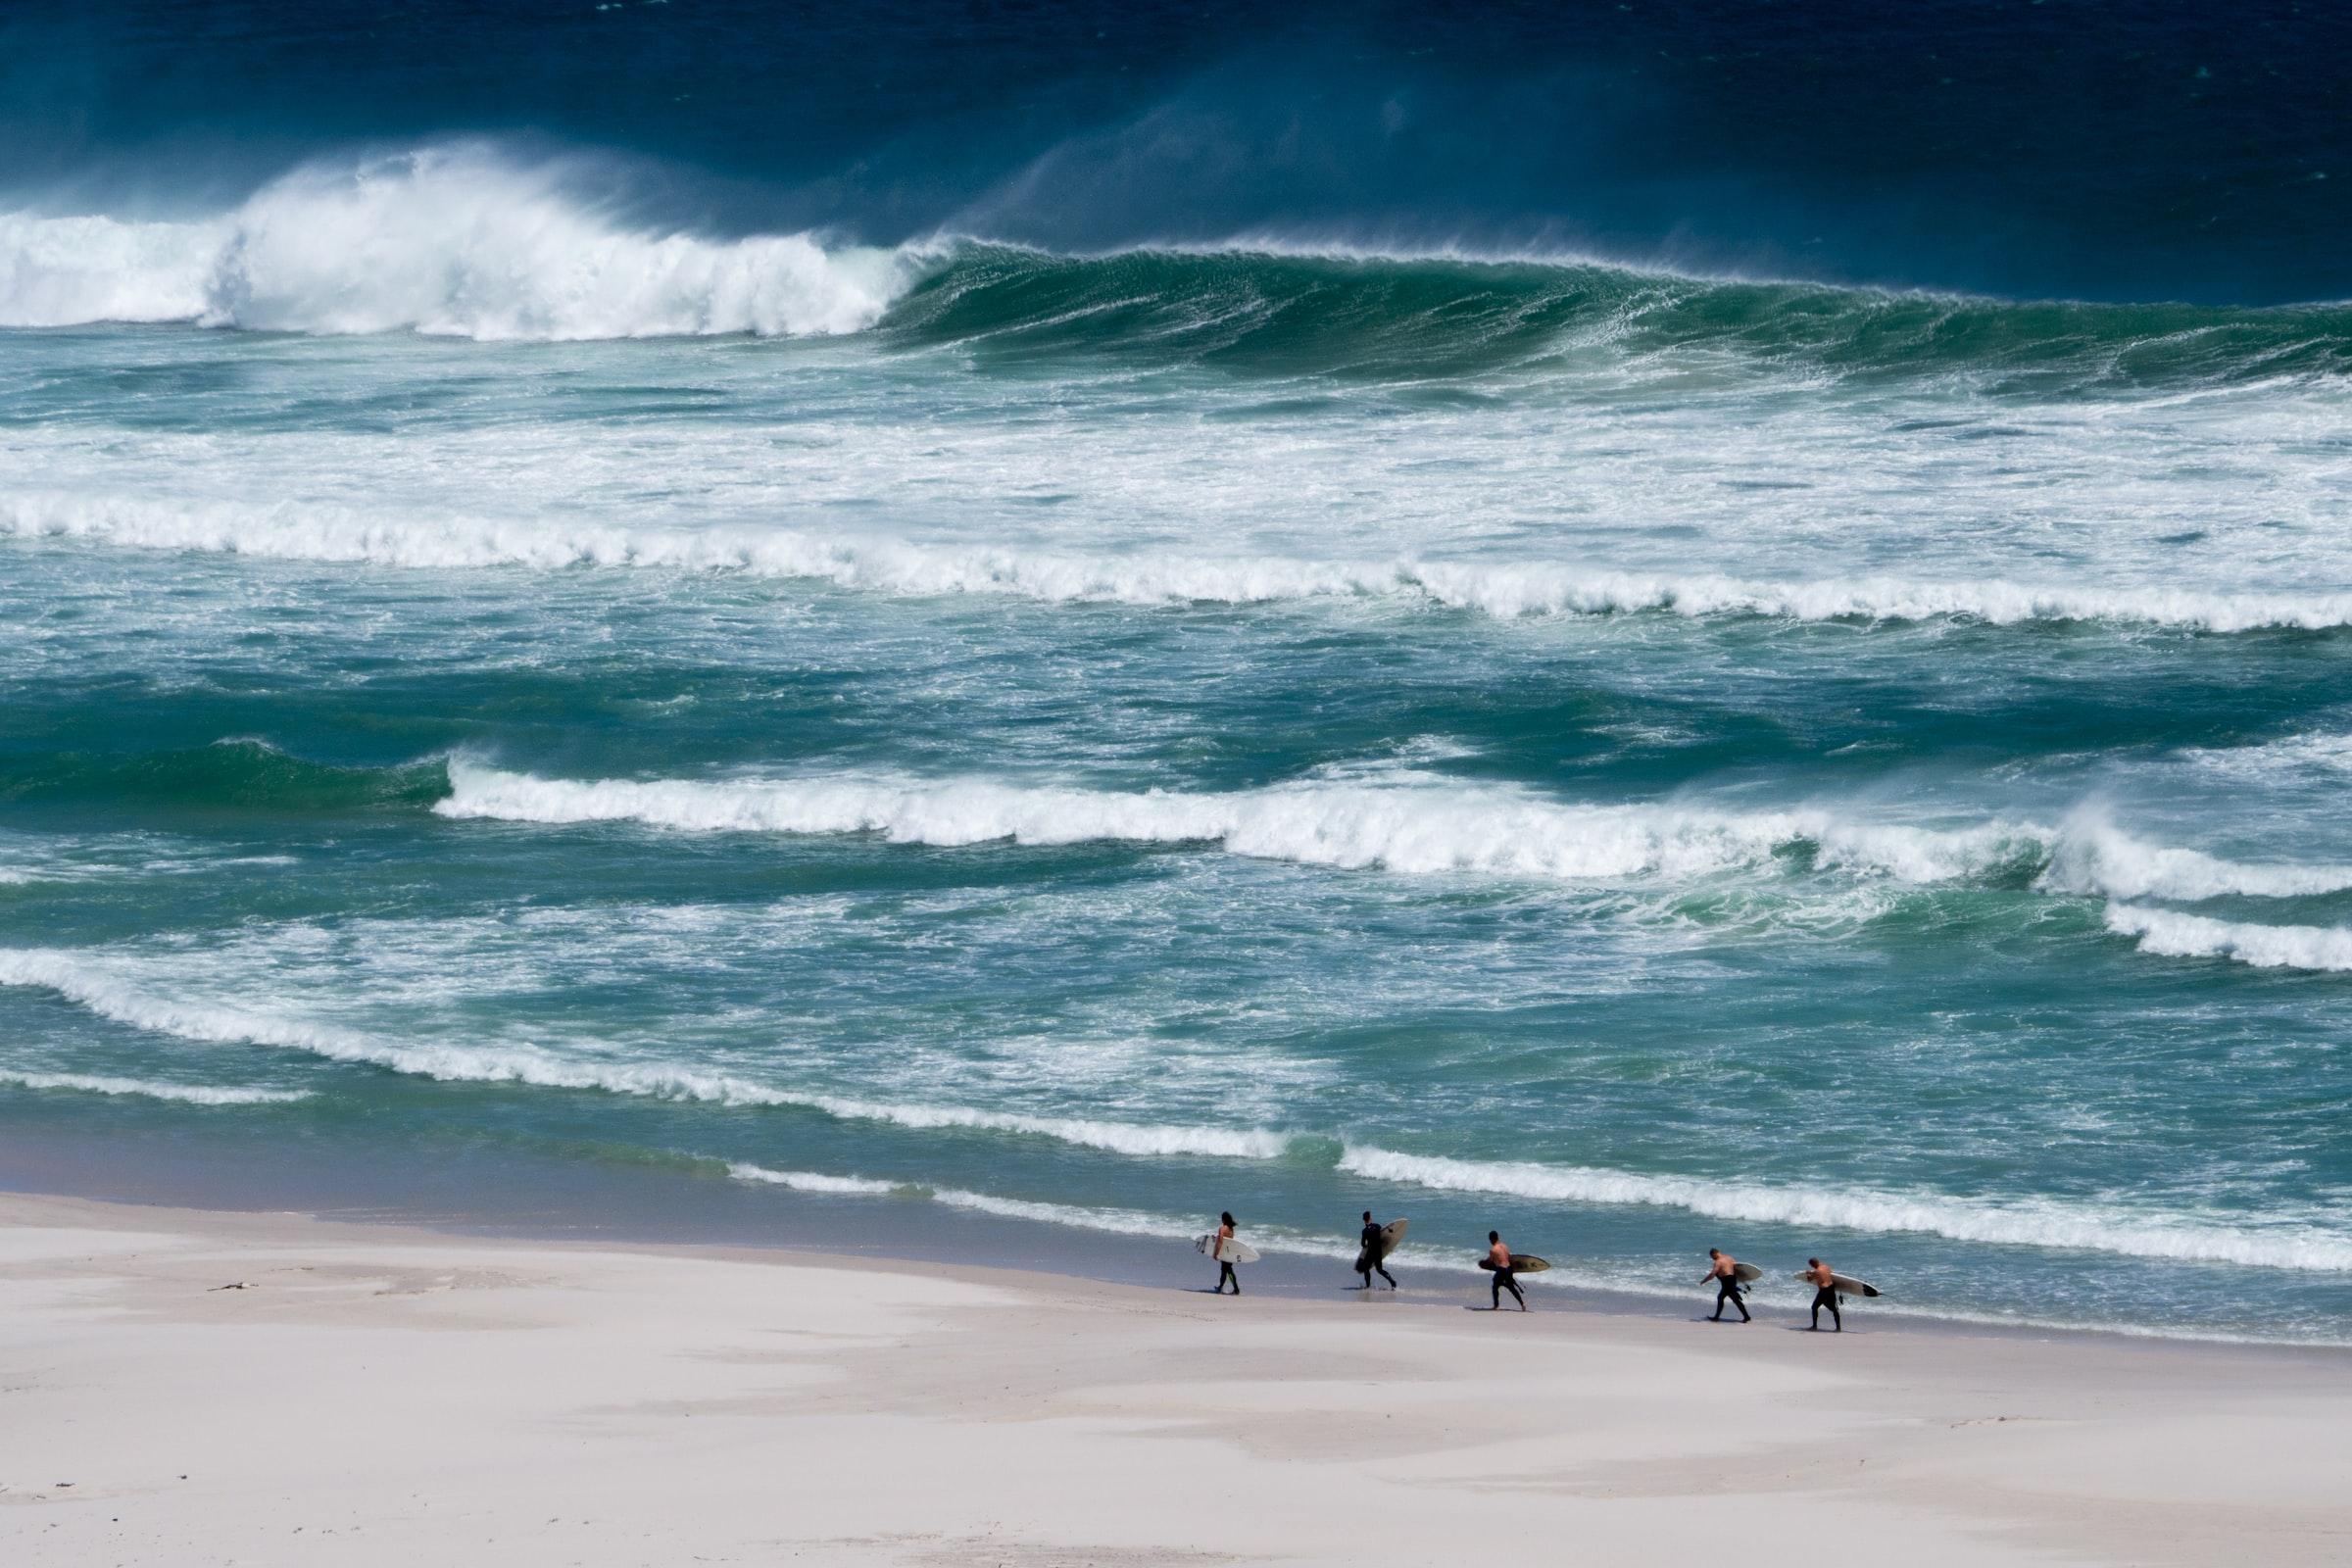 people carrying surfboard in seashore